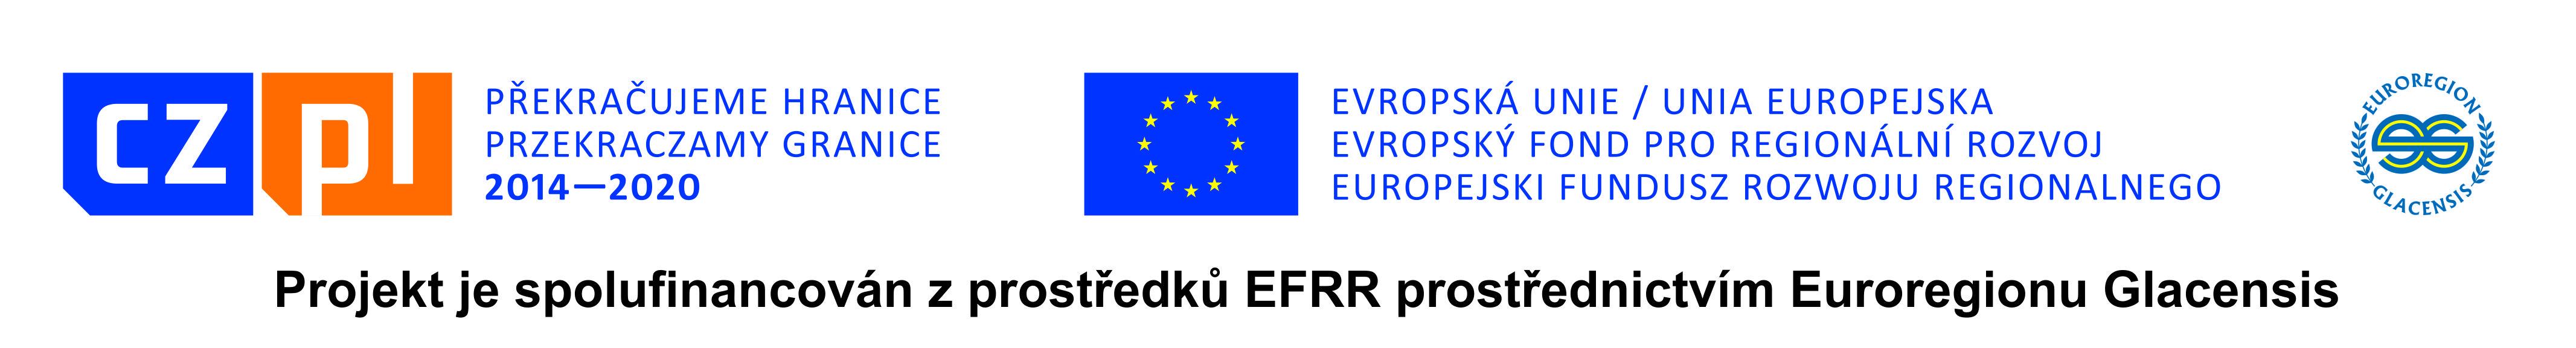 https://www.euro-glacensis.cz/files/2016_interreg_v-a/cz-pl-efrr-vektor.jpg